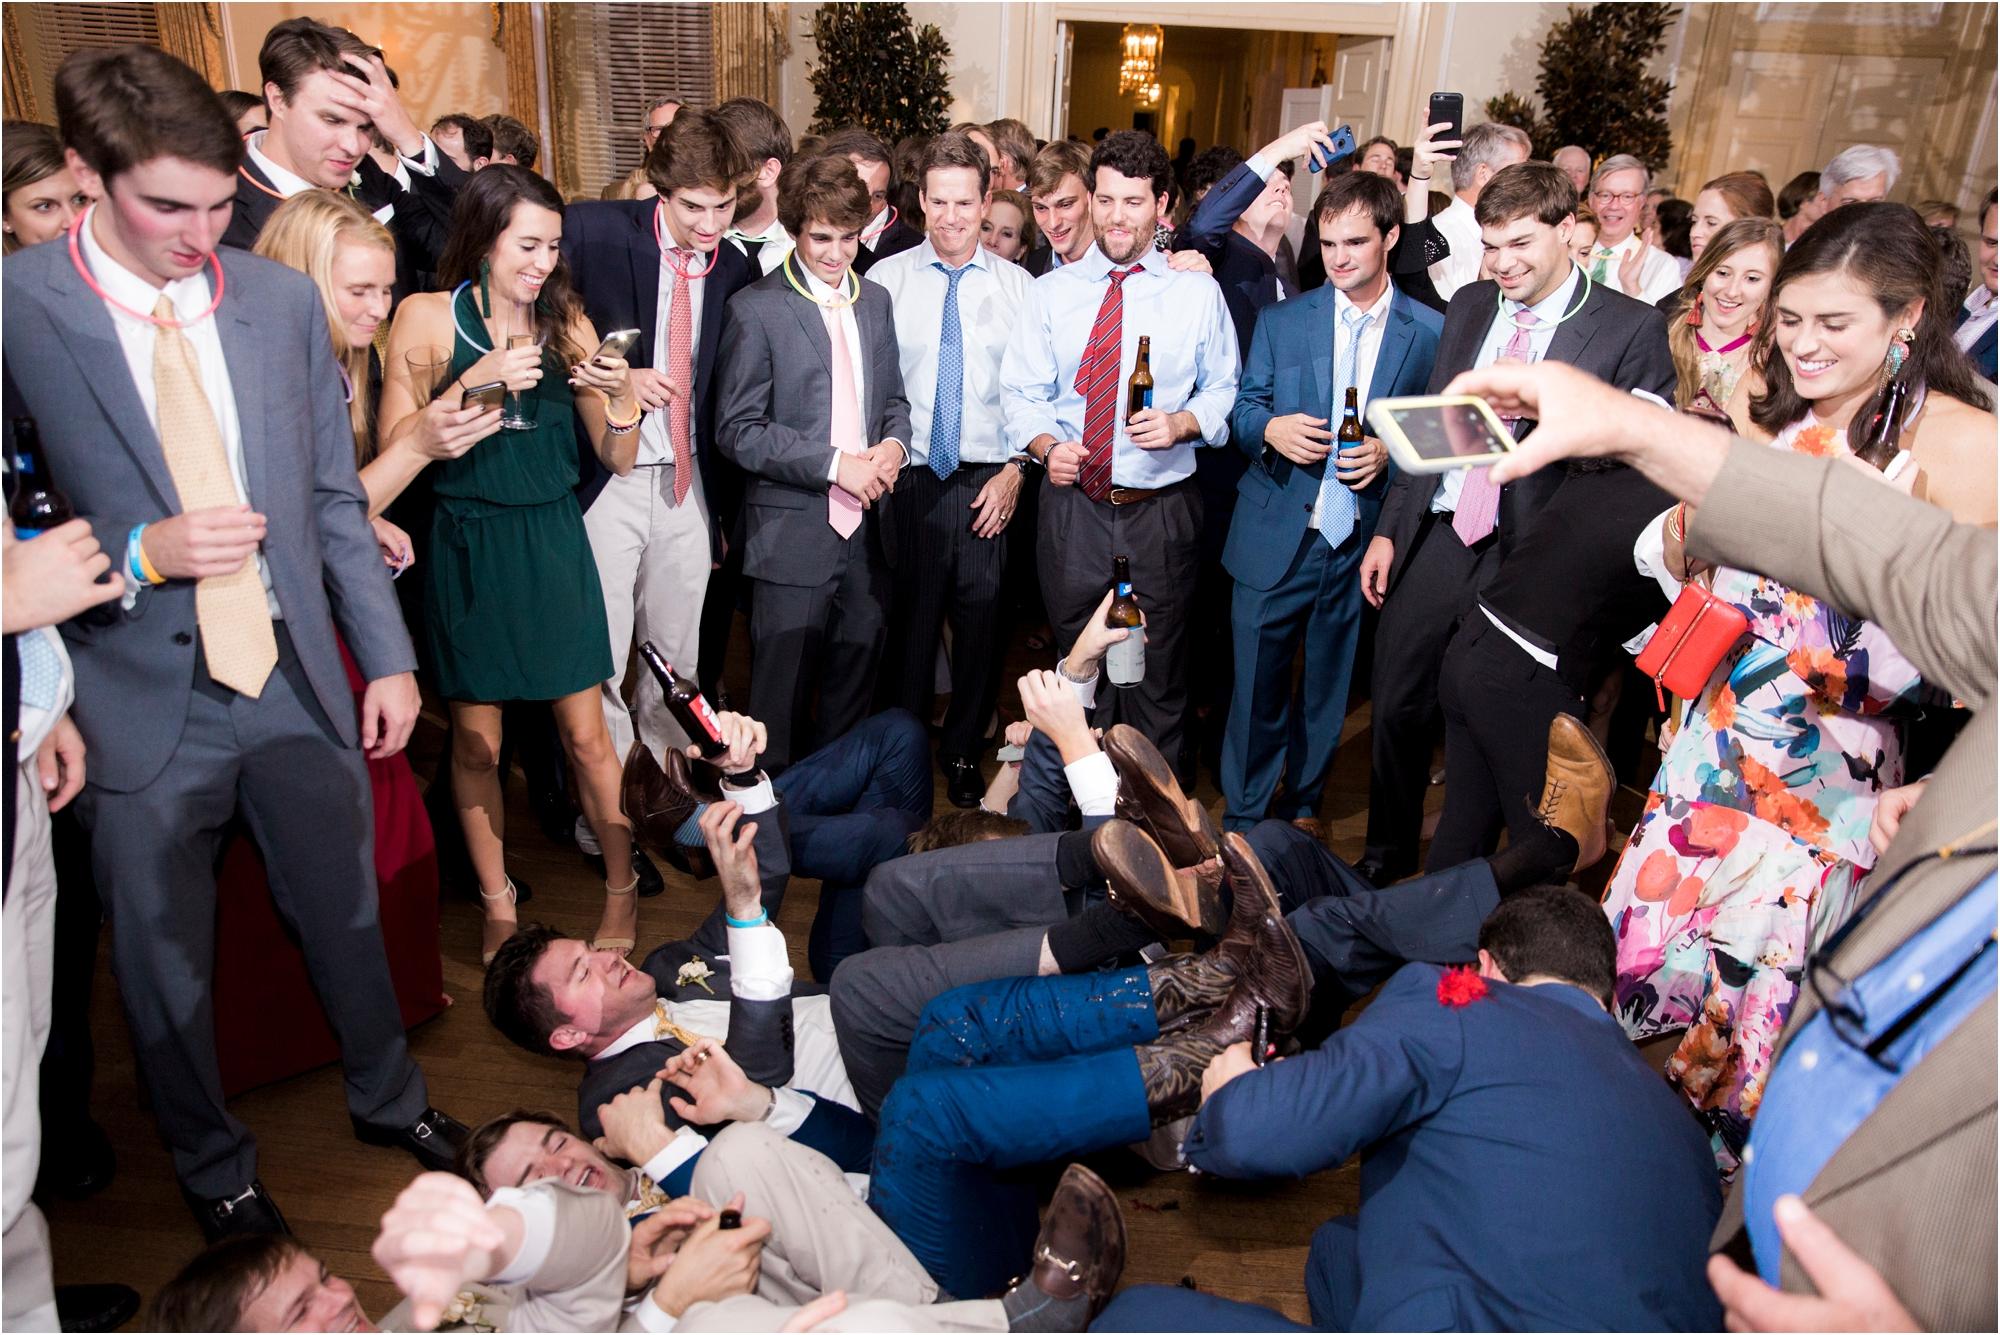 claire-thomas-farmington-country-club-charlottesville-virginia-wedding-photos_0062.jpg